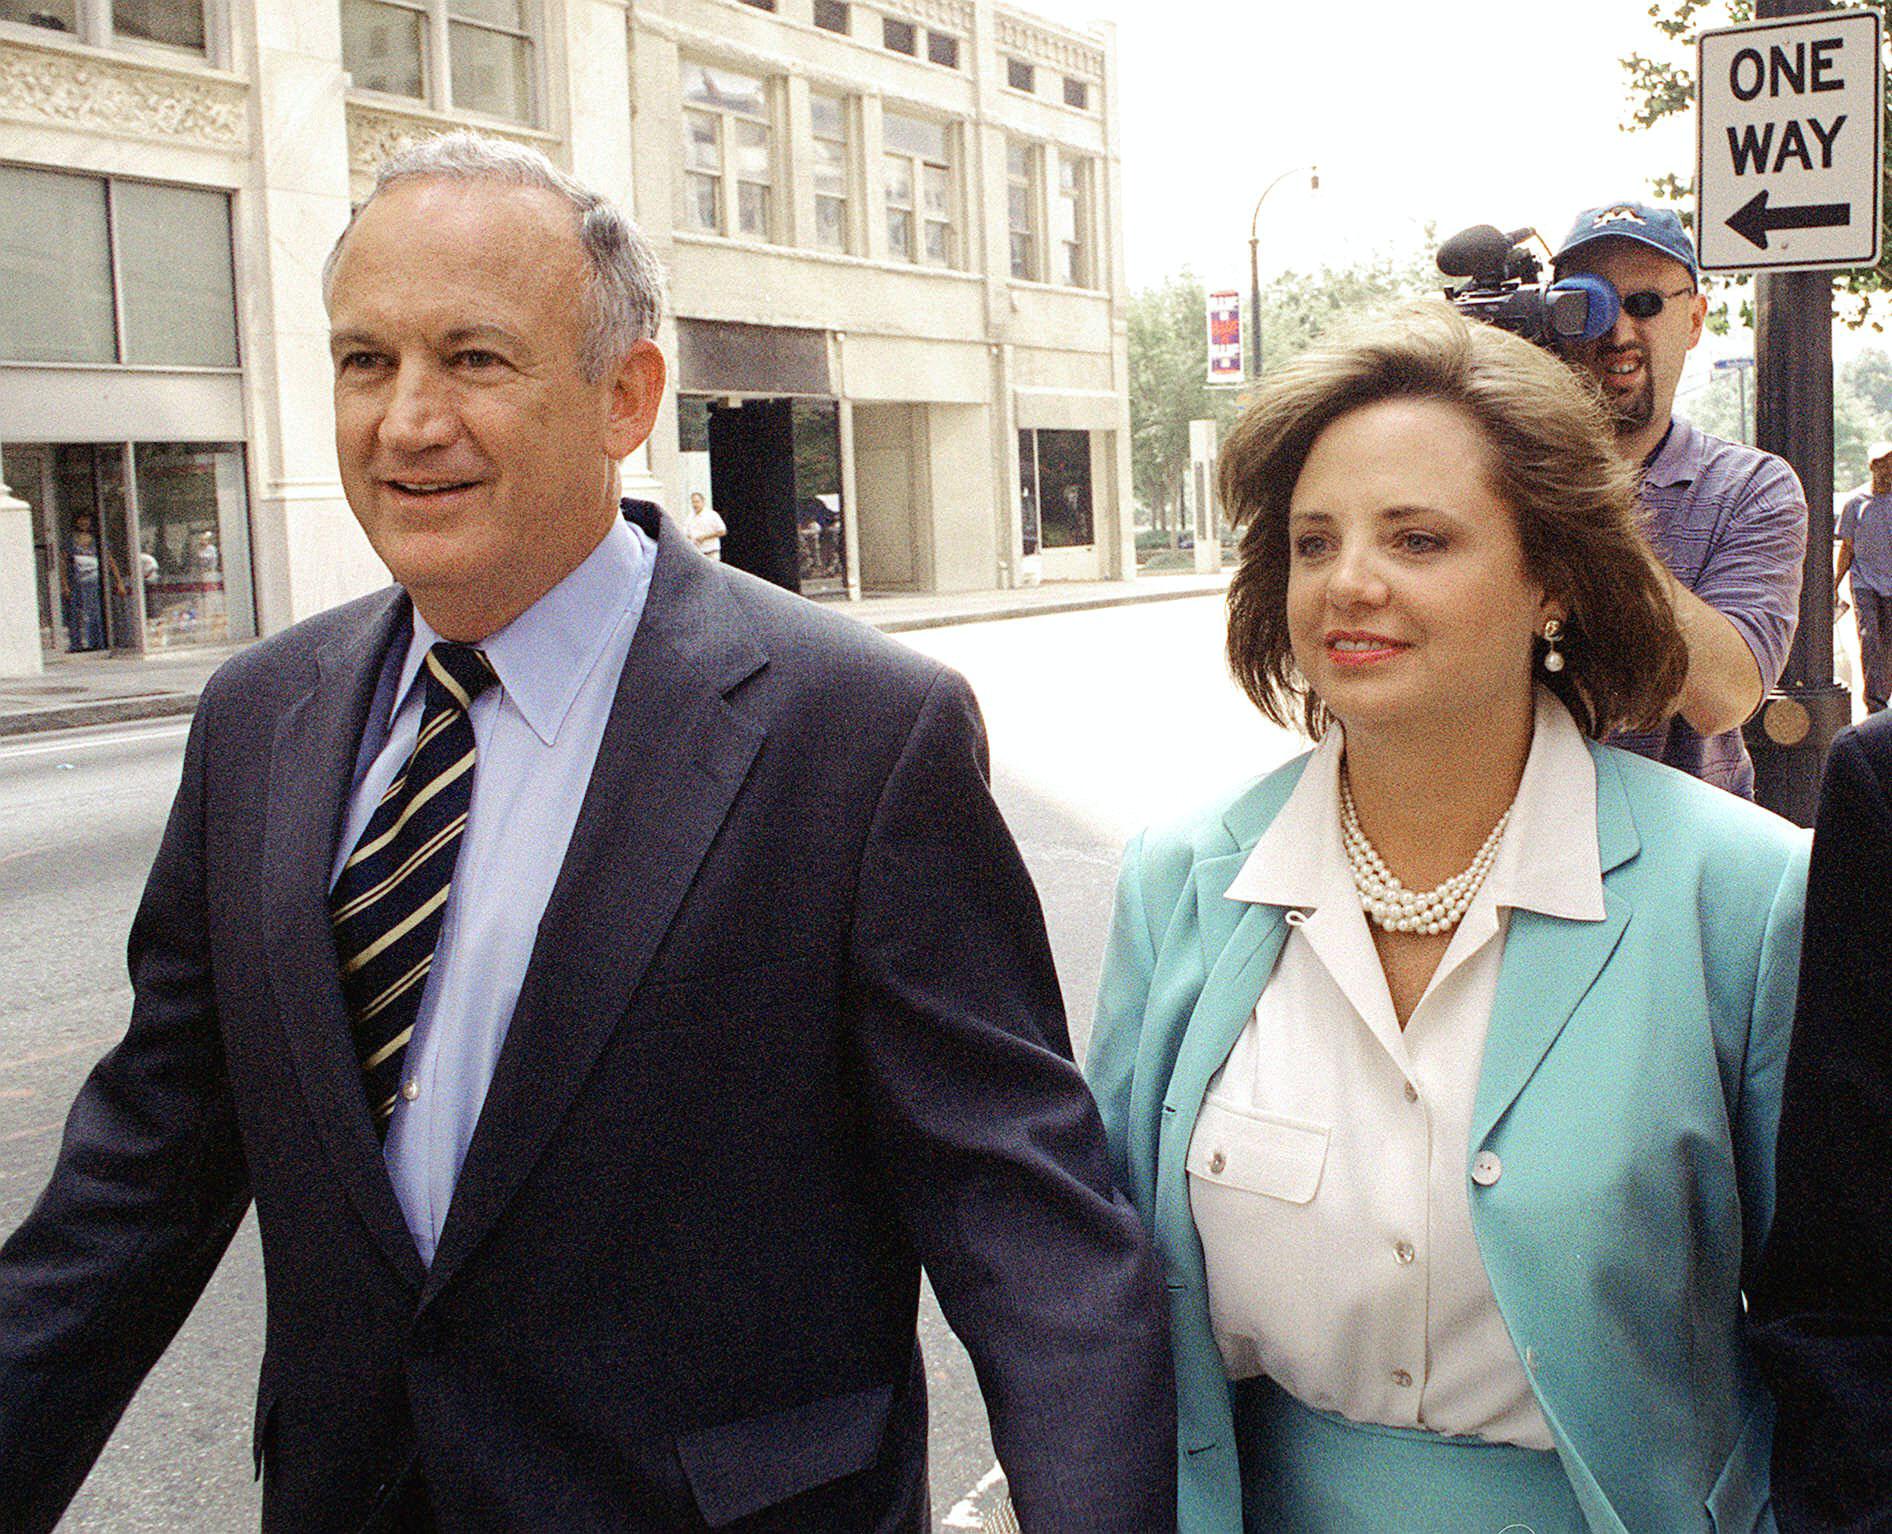 John and Patsy Ramsey JonBenet Ramsey